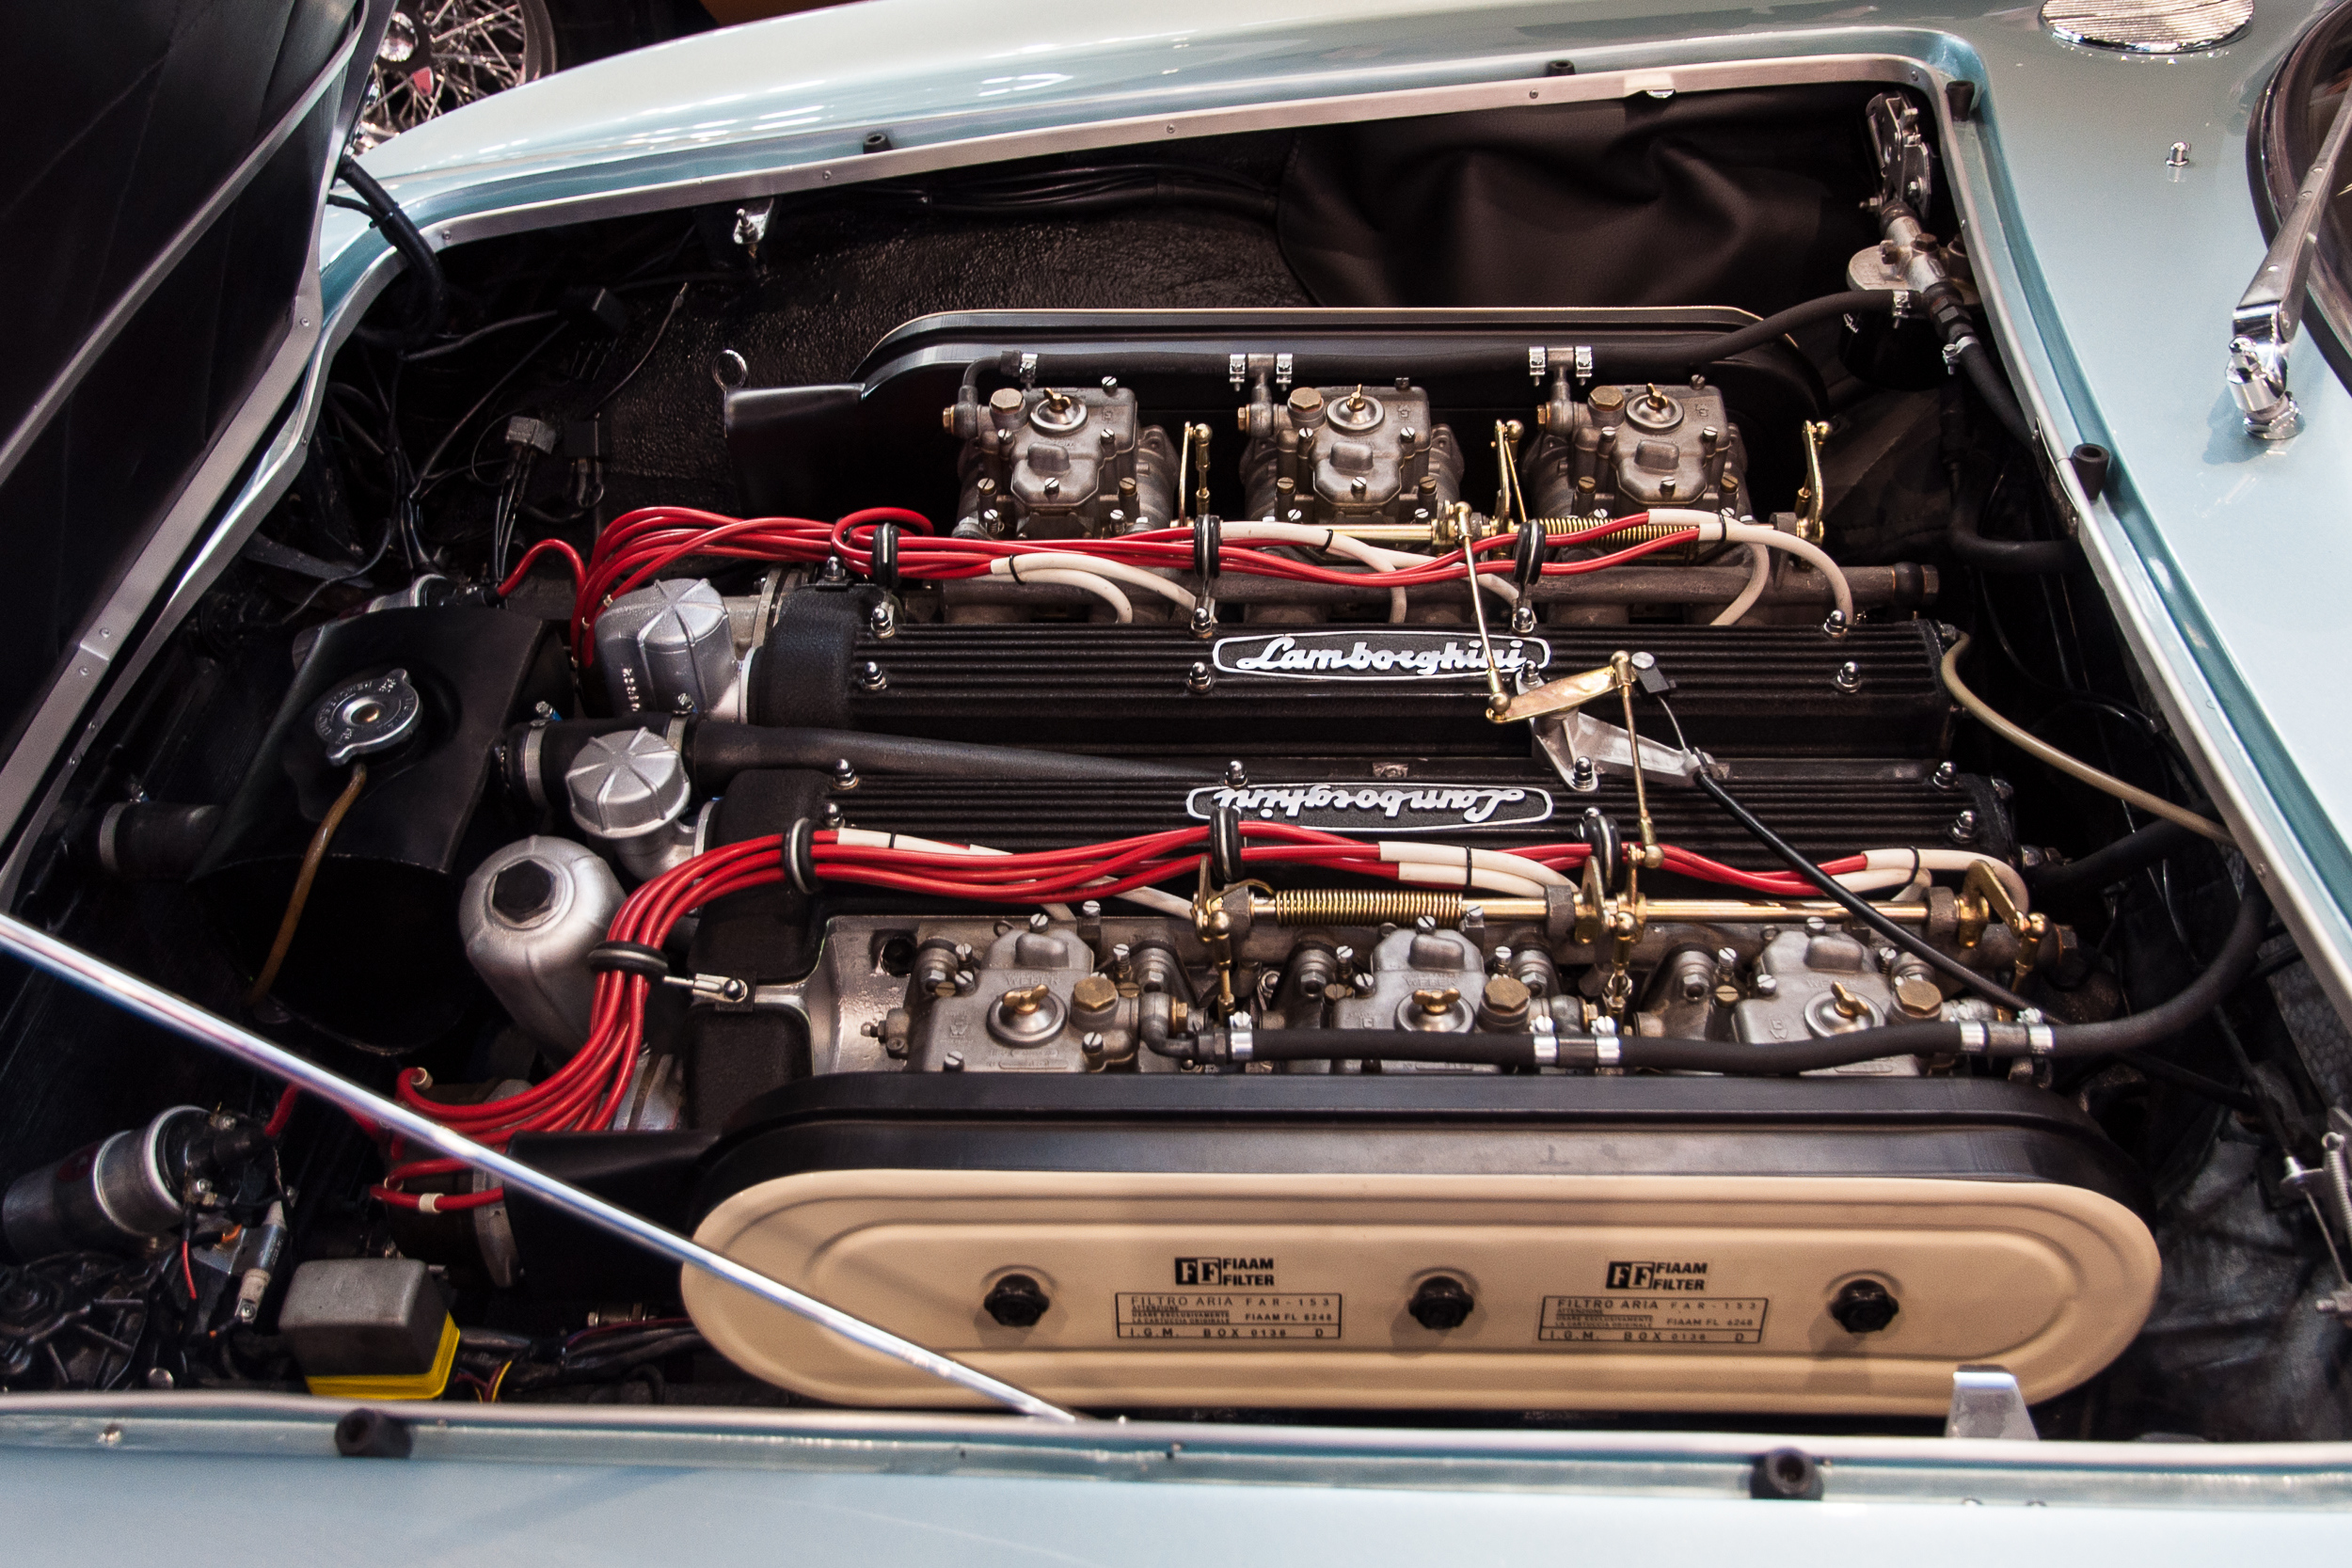 https://upload.wikimedia.org/wikipedia/commons/7/7b/1966_Lamborghini_400_GT_2%2B2_engine.jpg